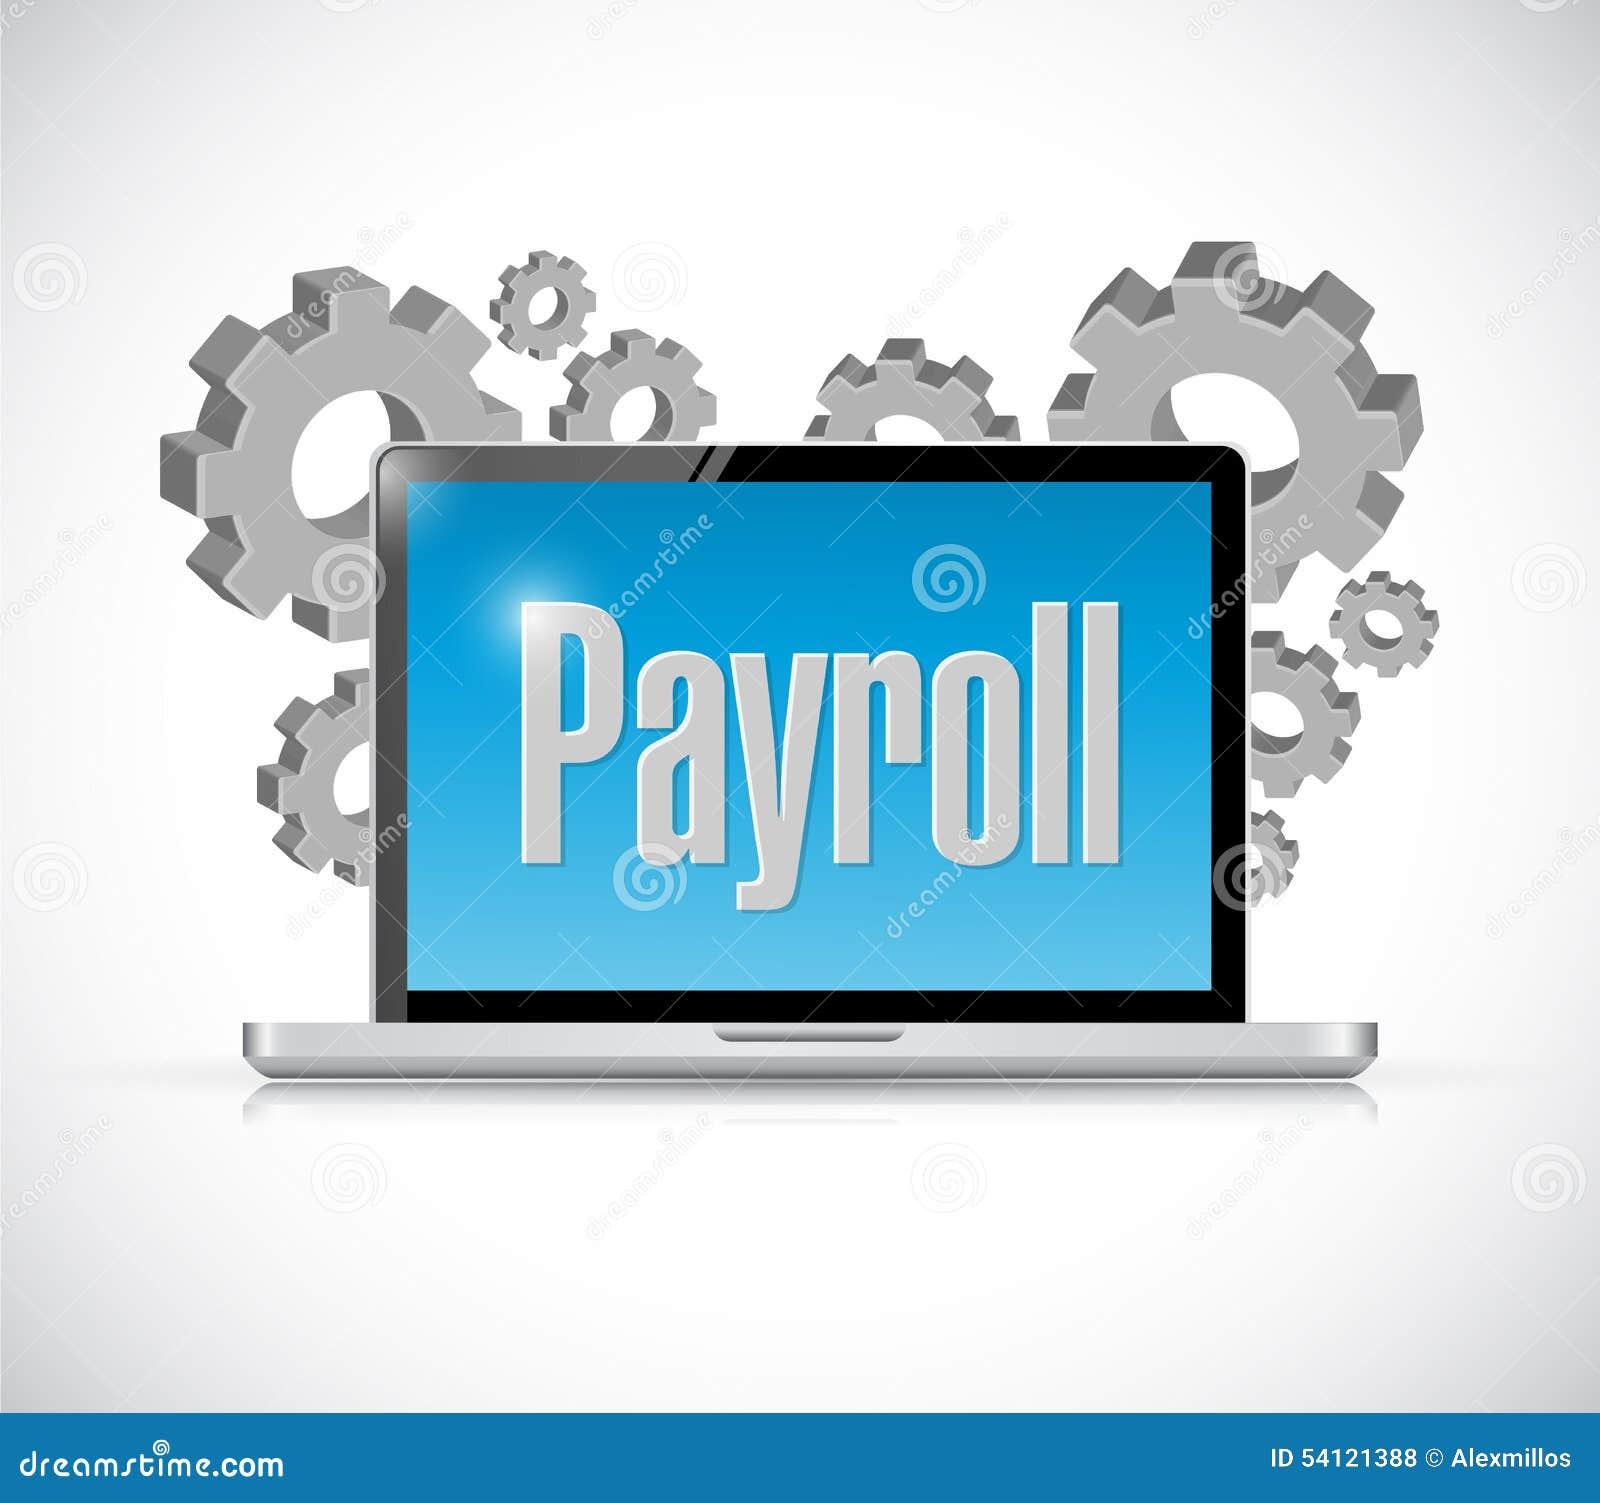 payroll free calculator